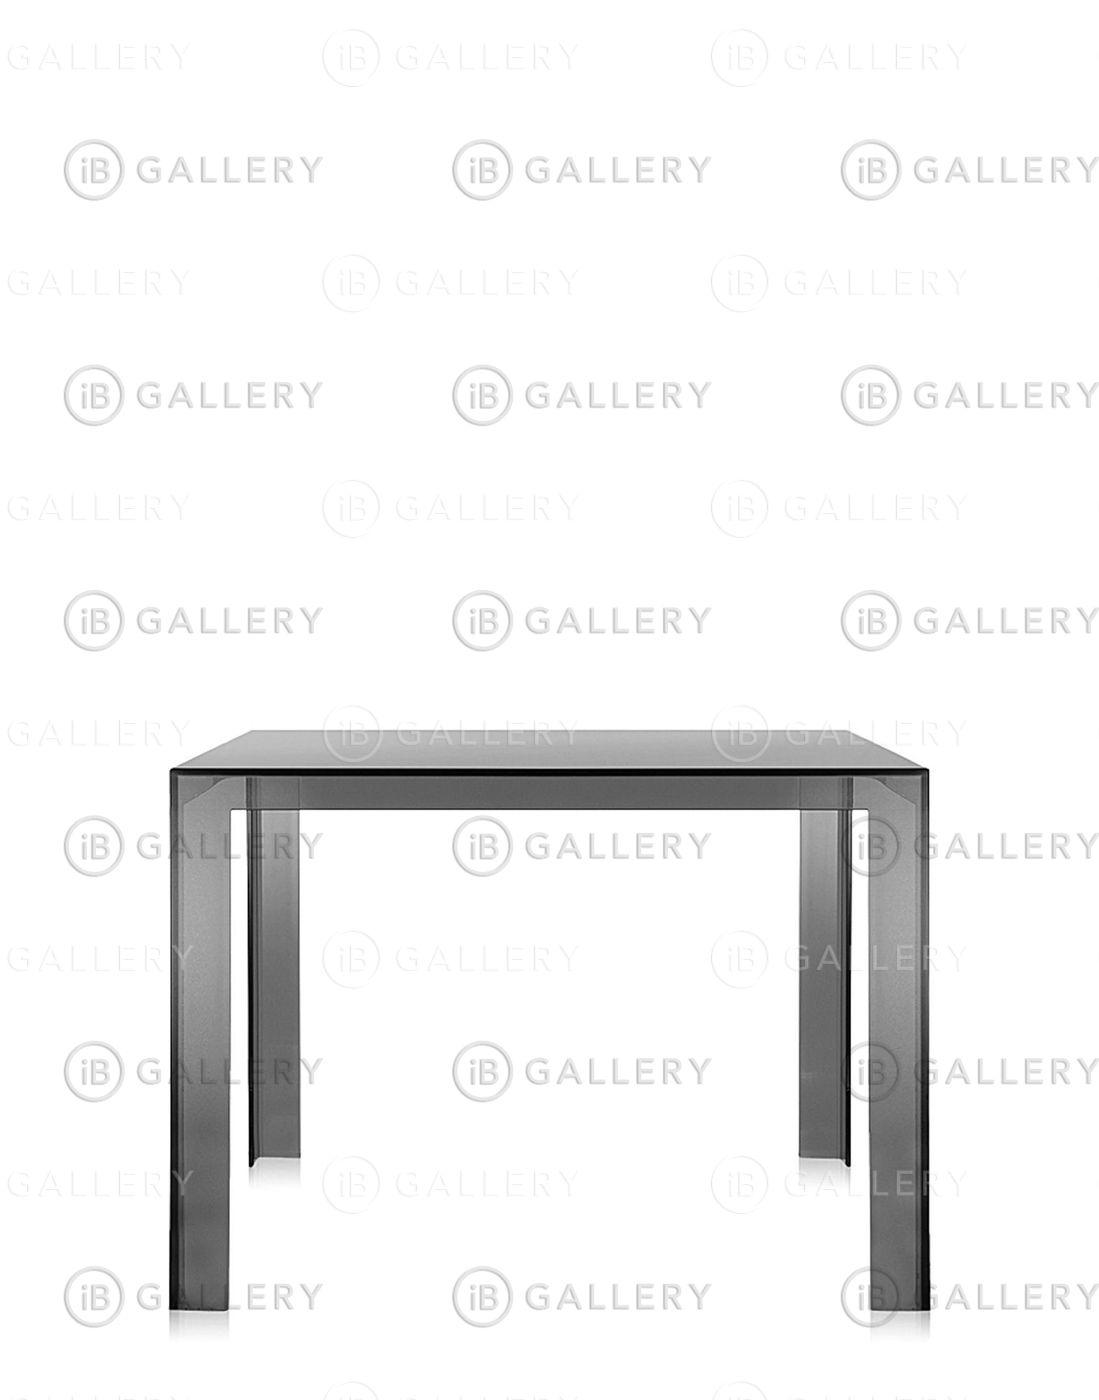 стильный стол Kartell Invisible Table 5070 из италии Ib Gallery